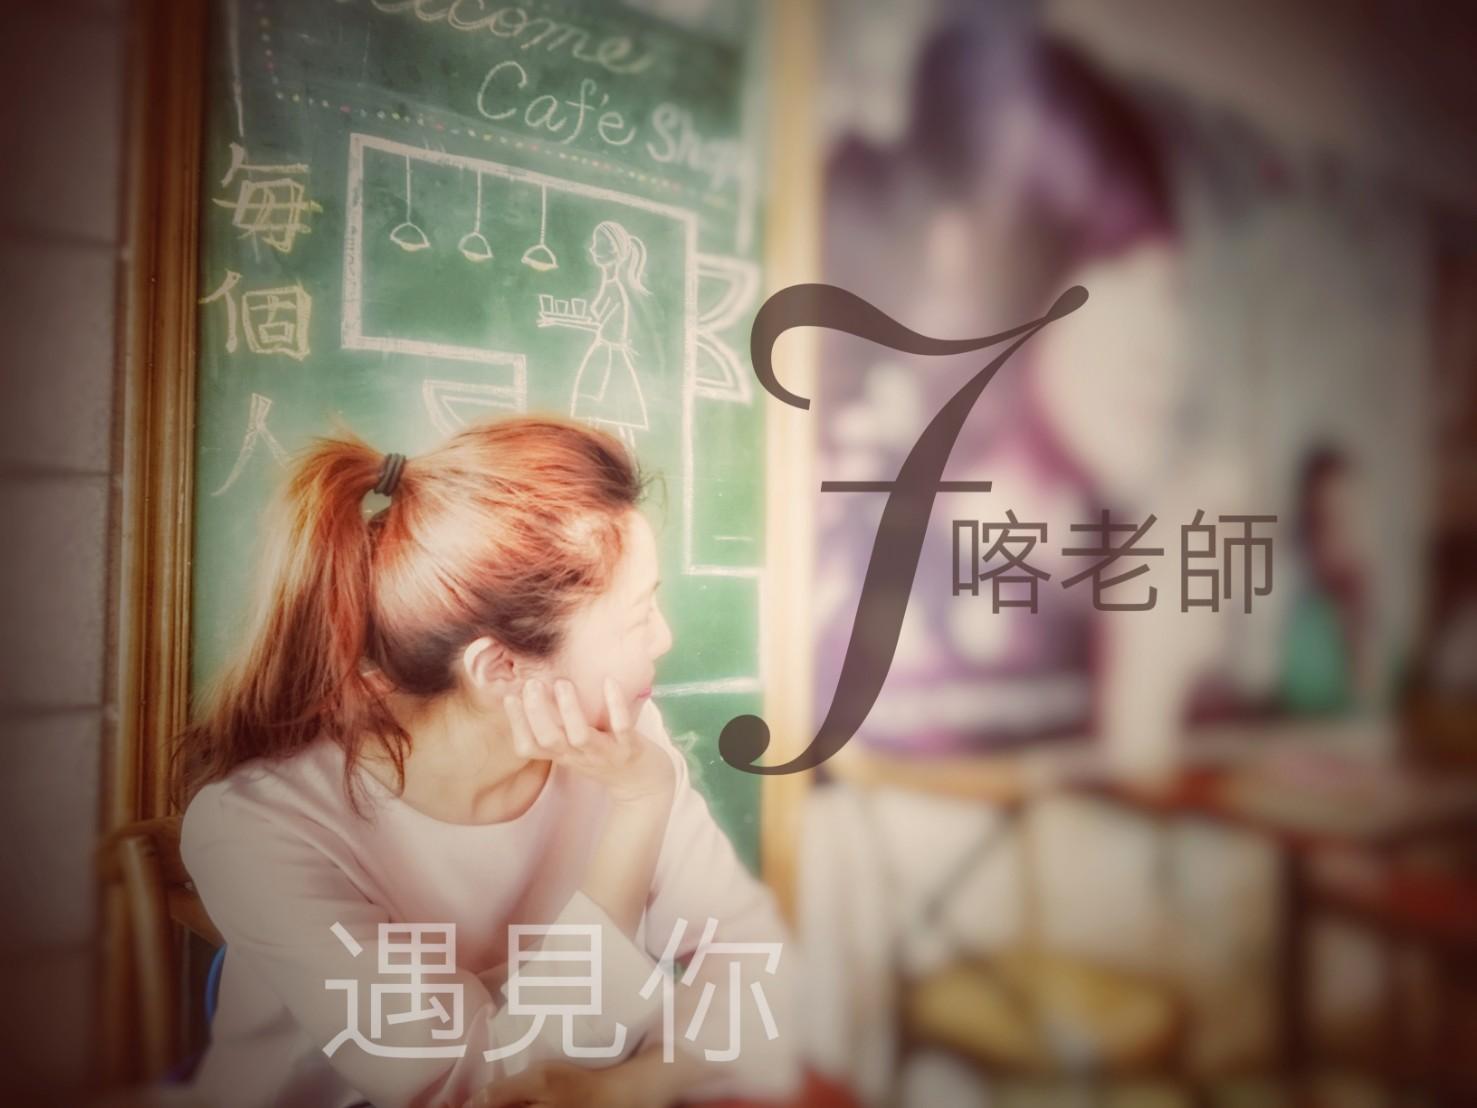 Ep28. 別糾結在校正回歸的字眼了!讓我們一起聽Podcast #在家救台灣!